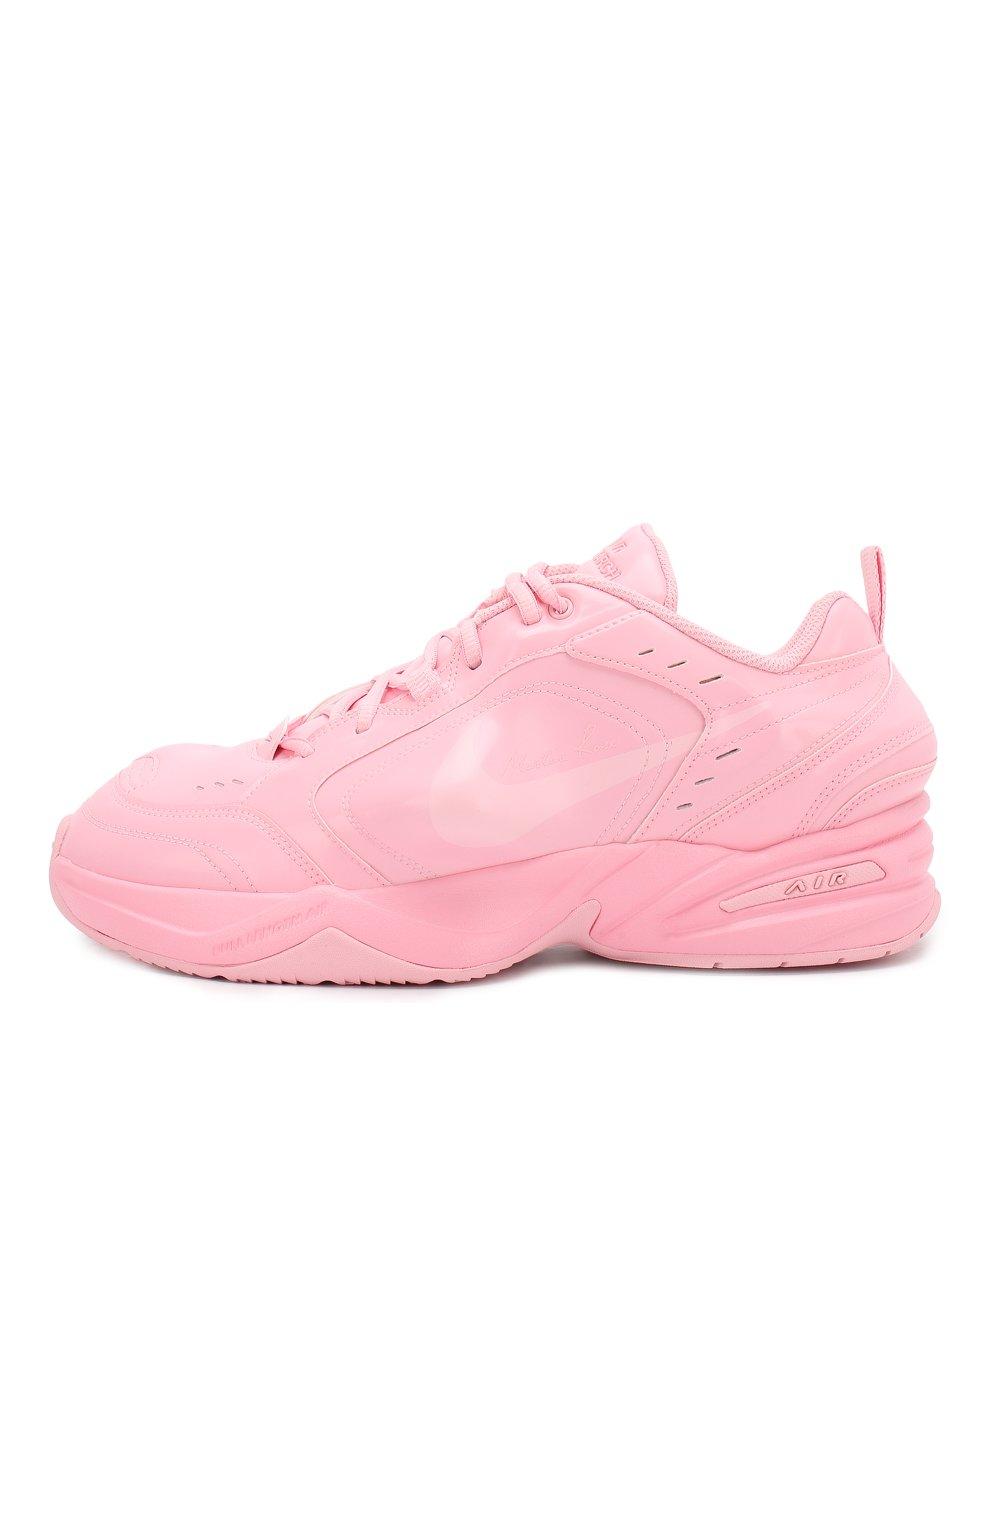 2f76e8a92 Кожаные кроссовки NikeLab x Martine Rose Air Monarch IV NikeLab розовые |  Фото №3